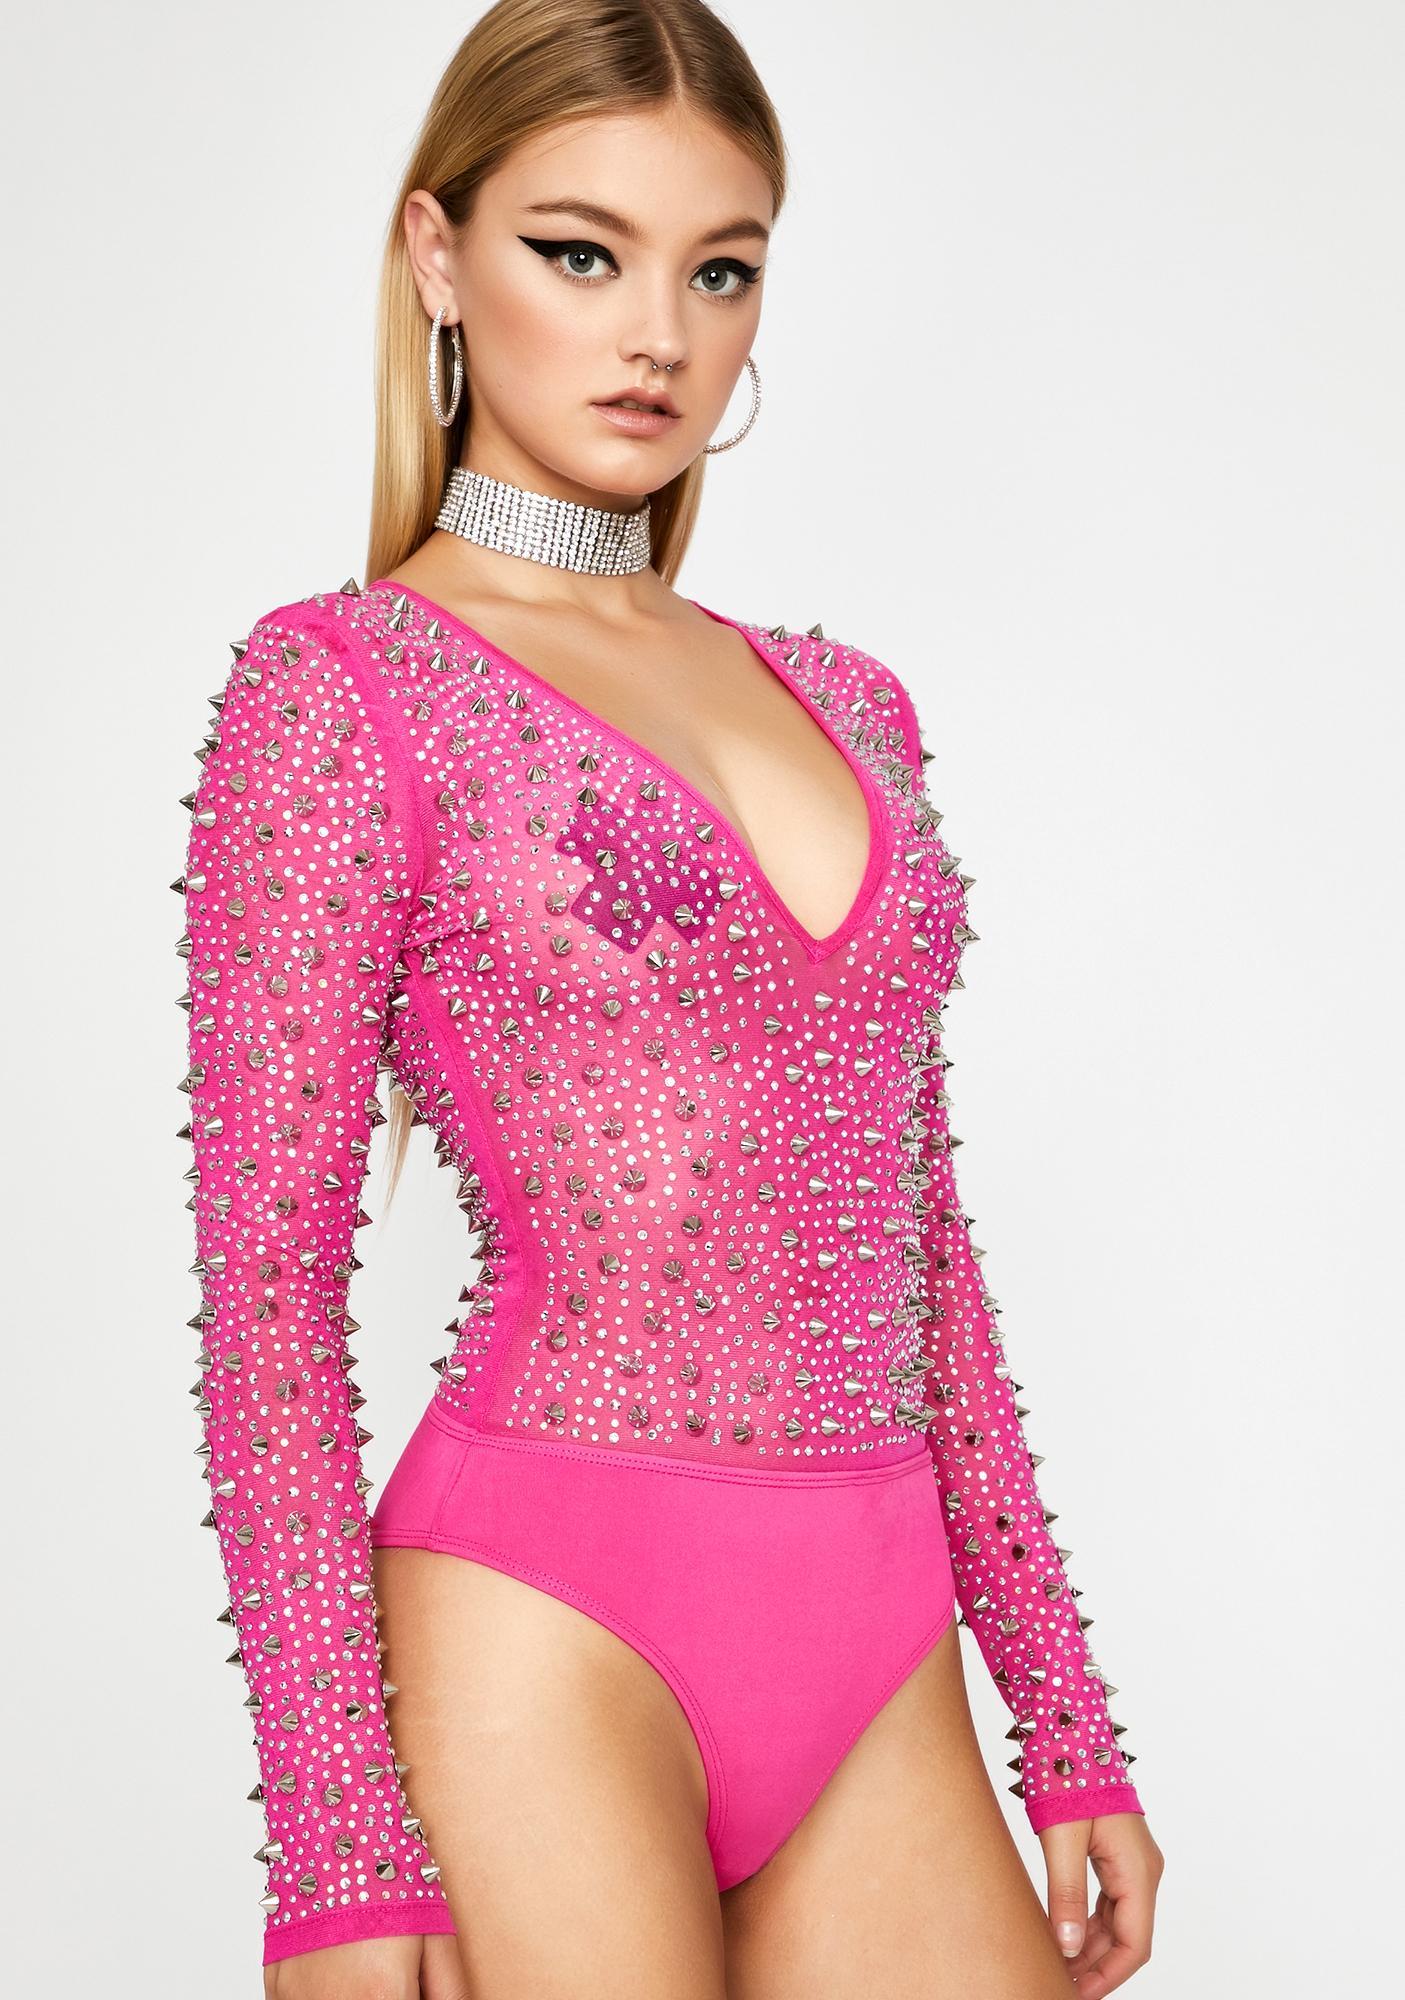 Killer Cute Studded Bodysuit